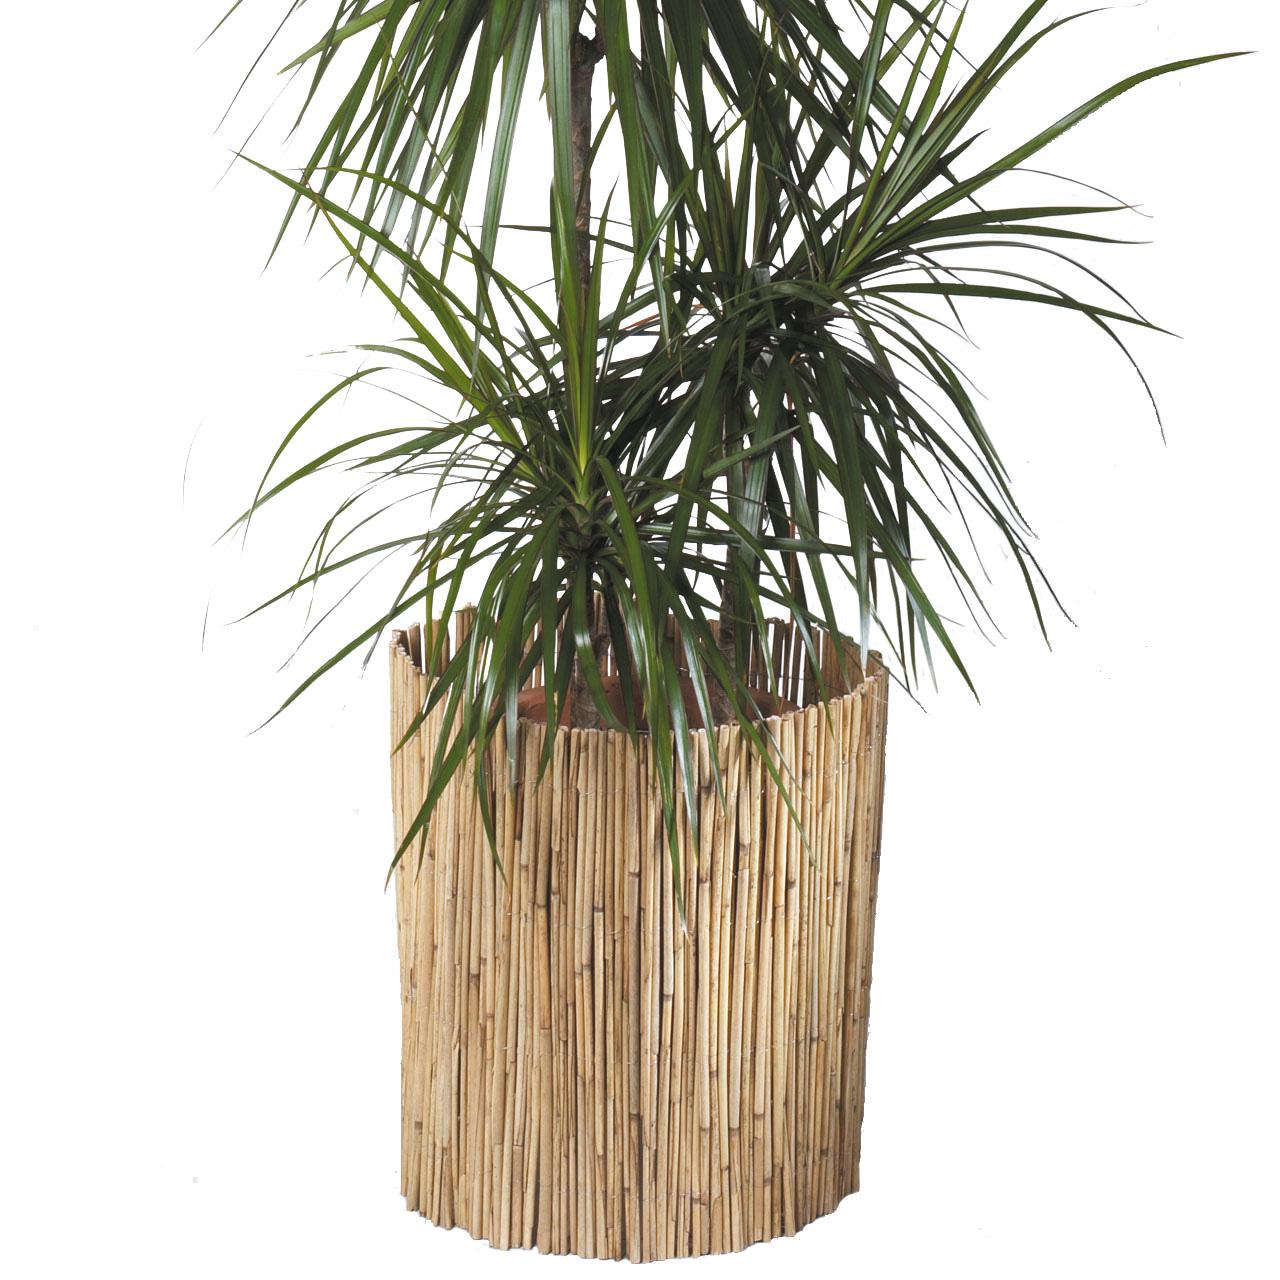 Schilfrohrmatte Winterschutz Pflanzen Natur Winterschutz De